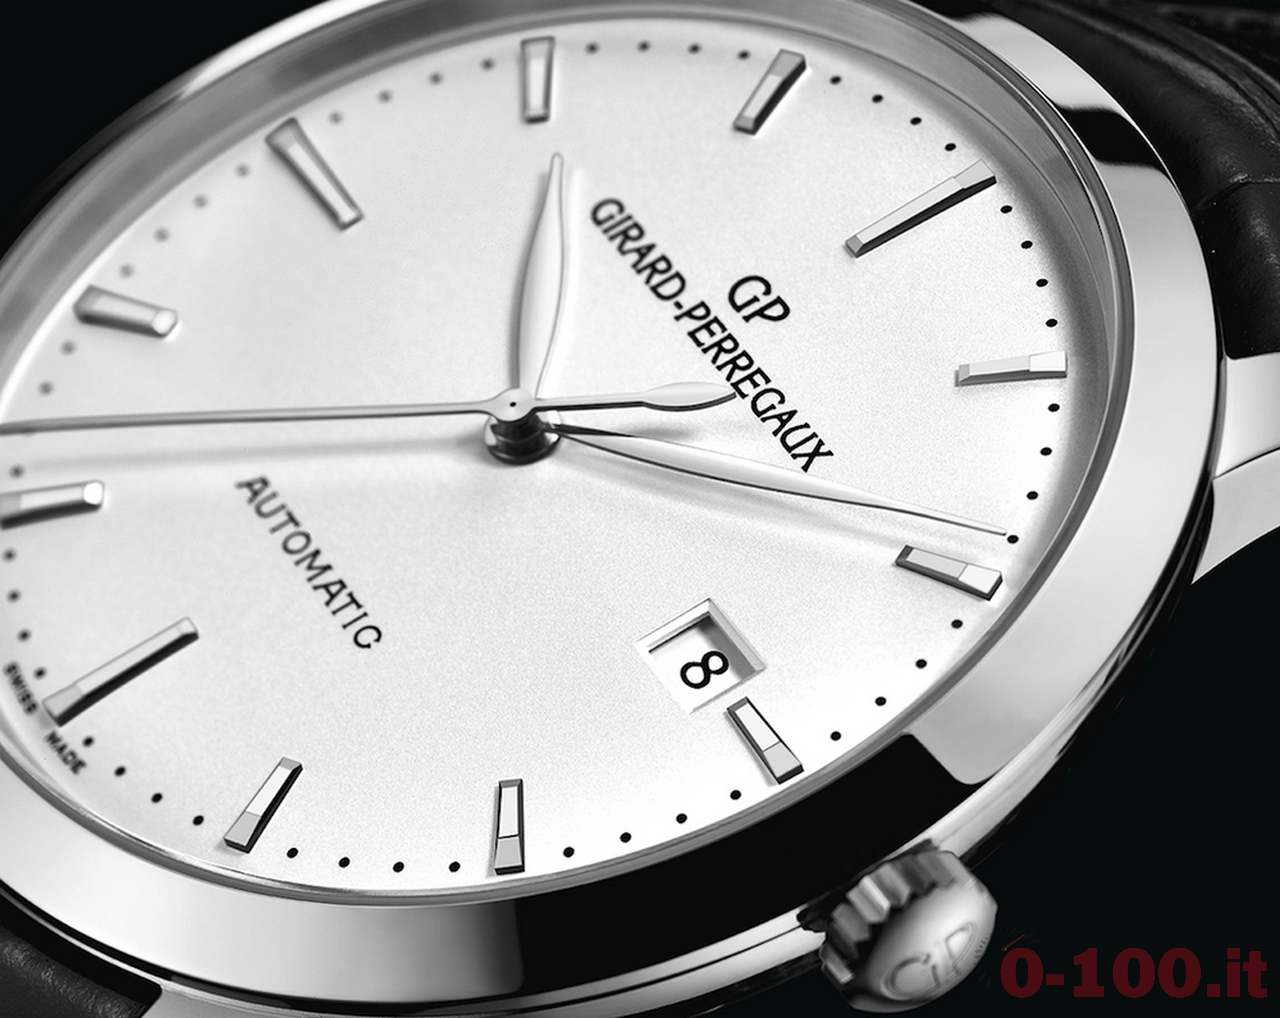 girard-perregaux-1966-steel-ref-49555-11-131-bb60-prezzo-price_0-1003